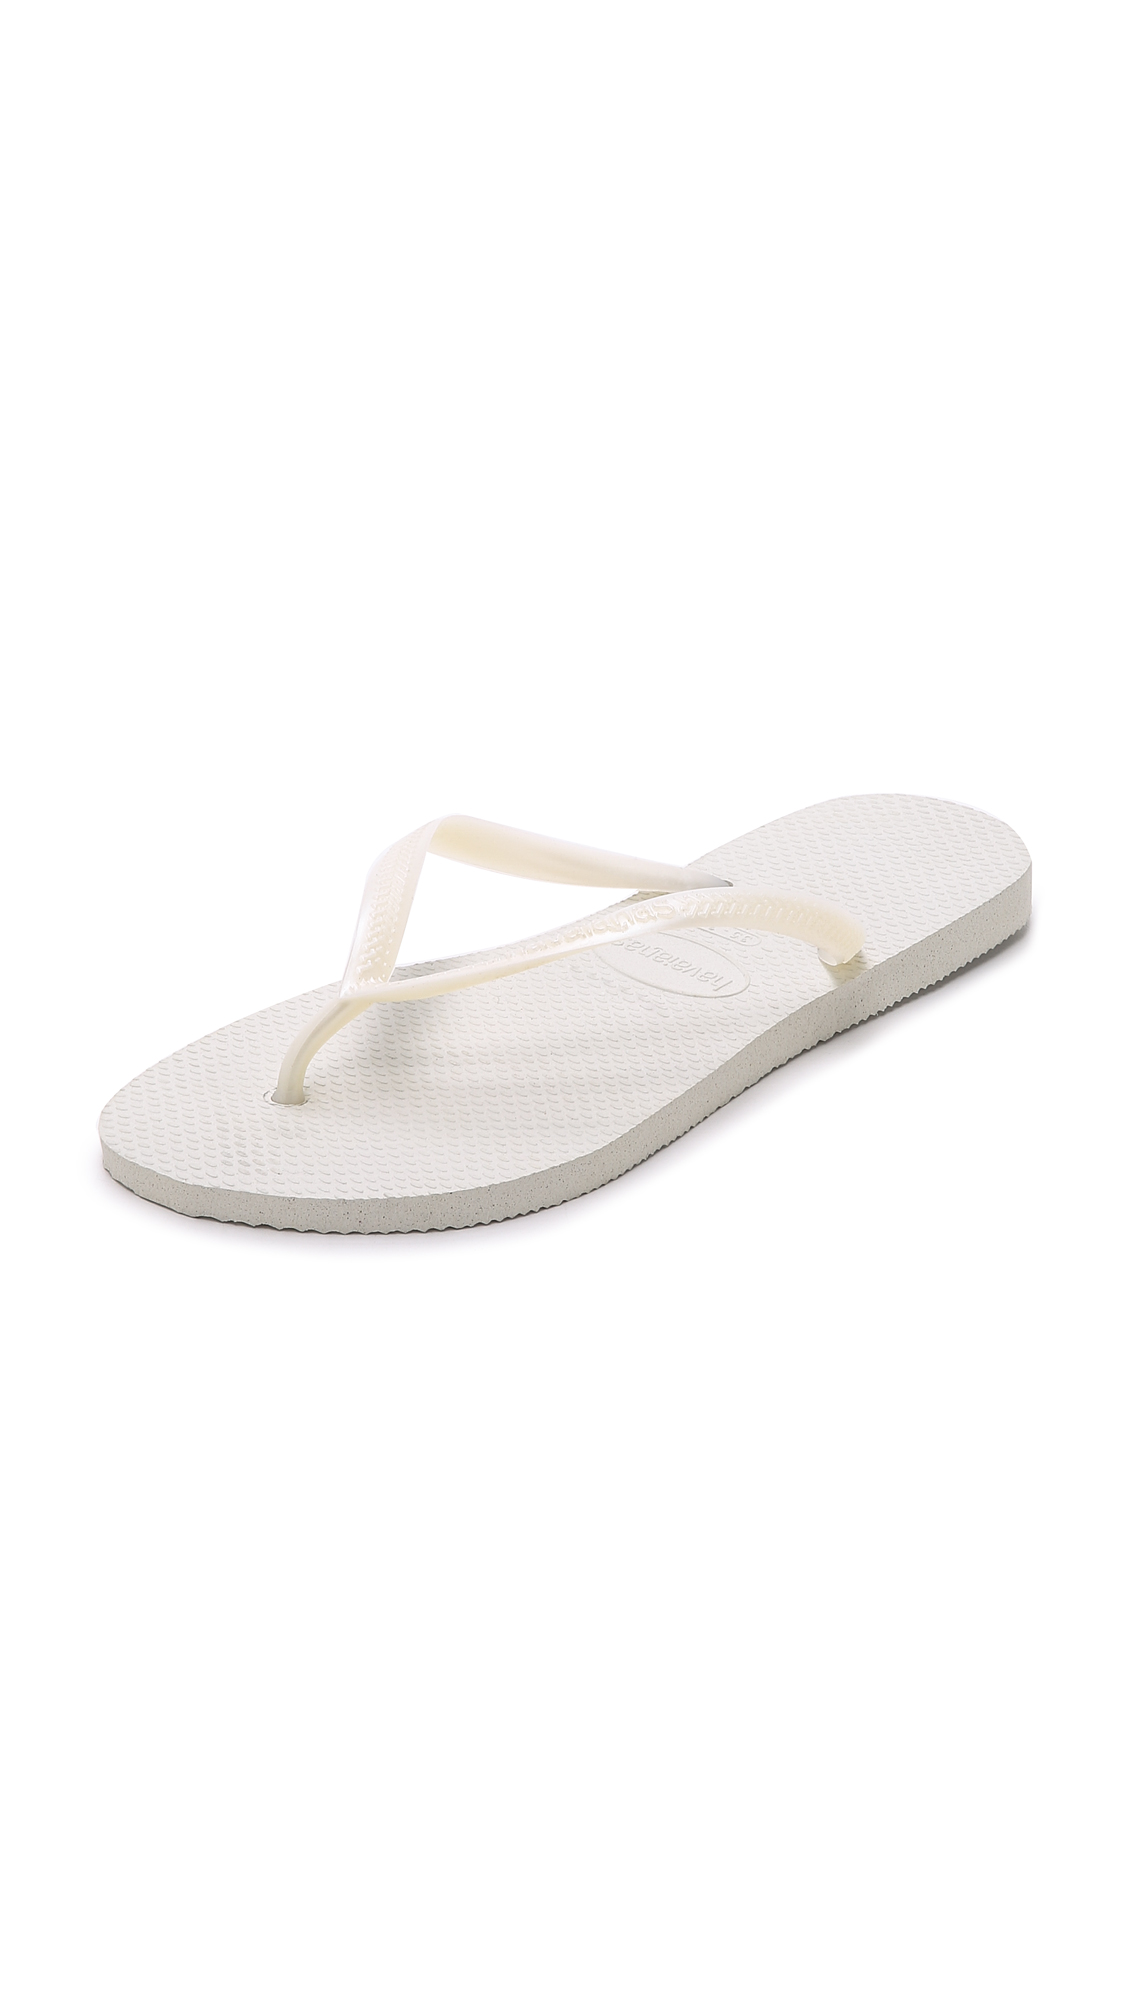 Havaianas Slim Flip Flops - White at Shopbop